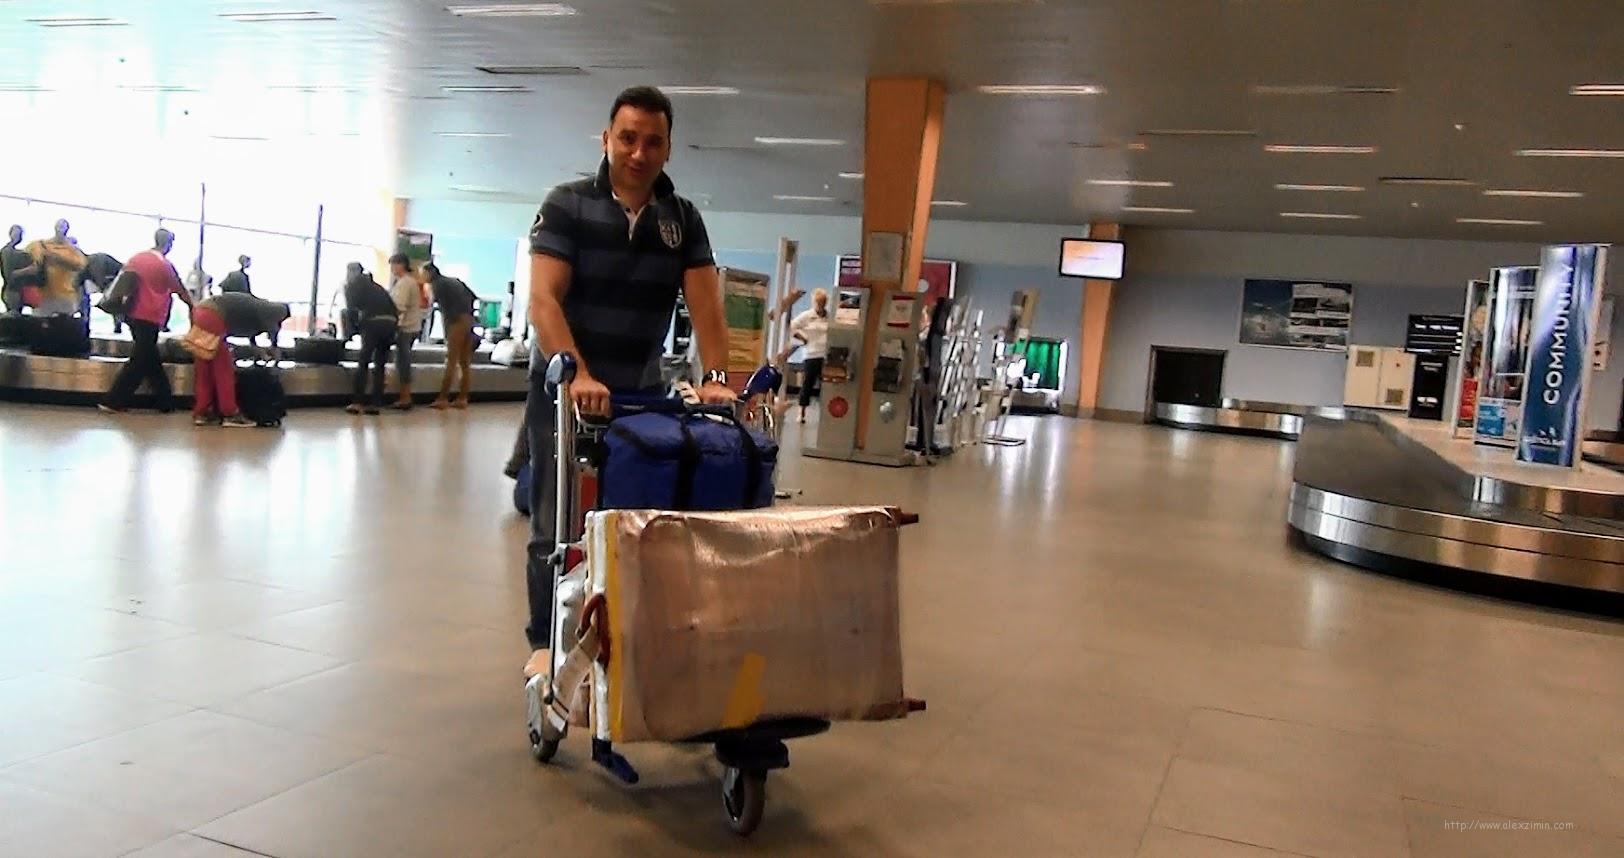 Аренда авто в Черногории в аэропорту Тиват. Алексей Зимин